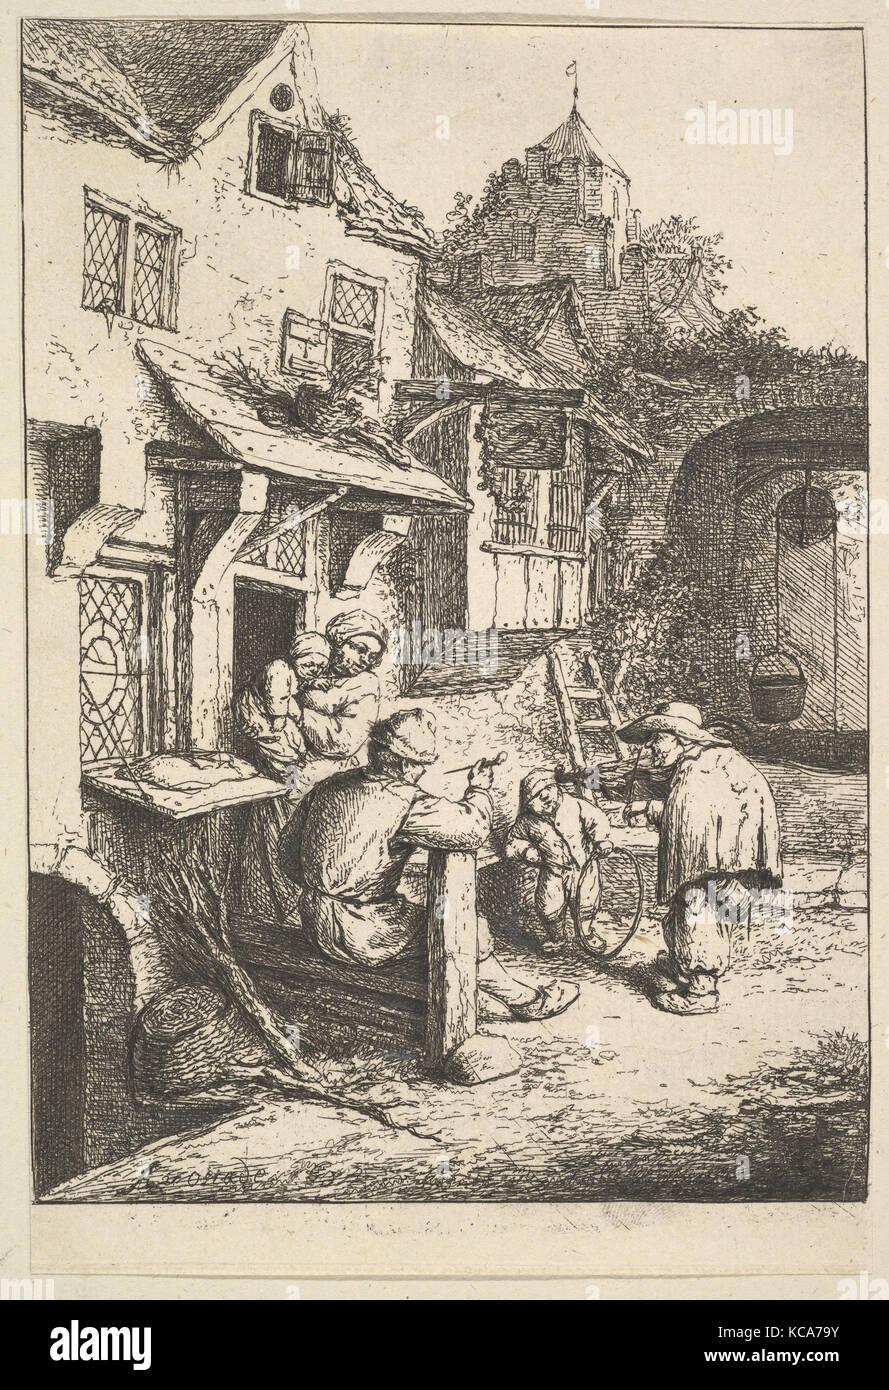 The Humpbacked Violinist, Adriaen van Ostade, 1610–85 - Stock Image